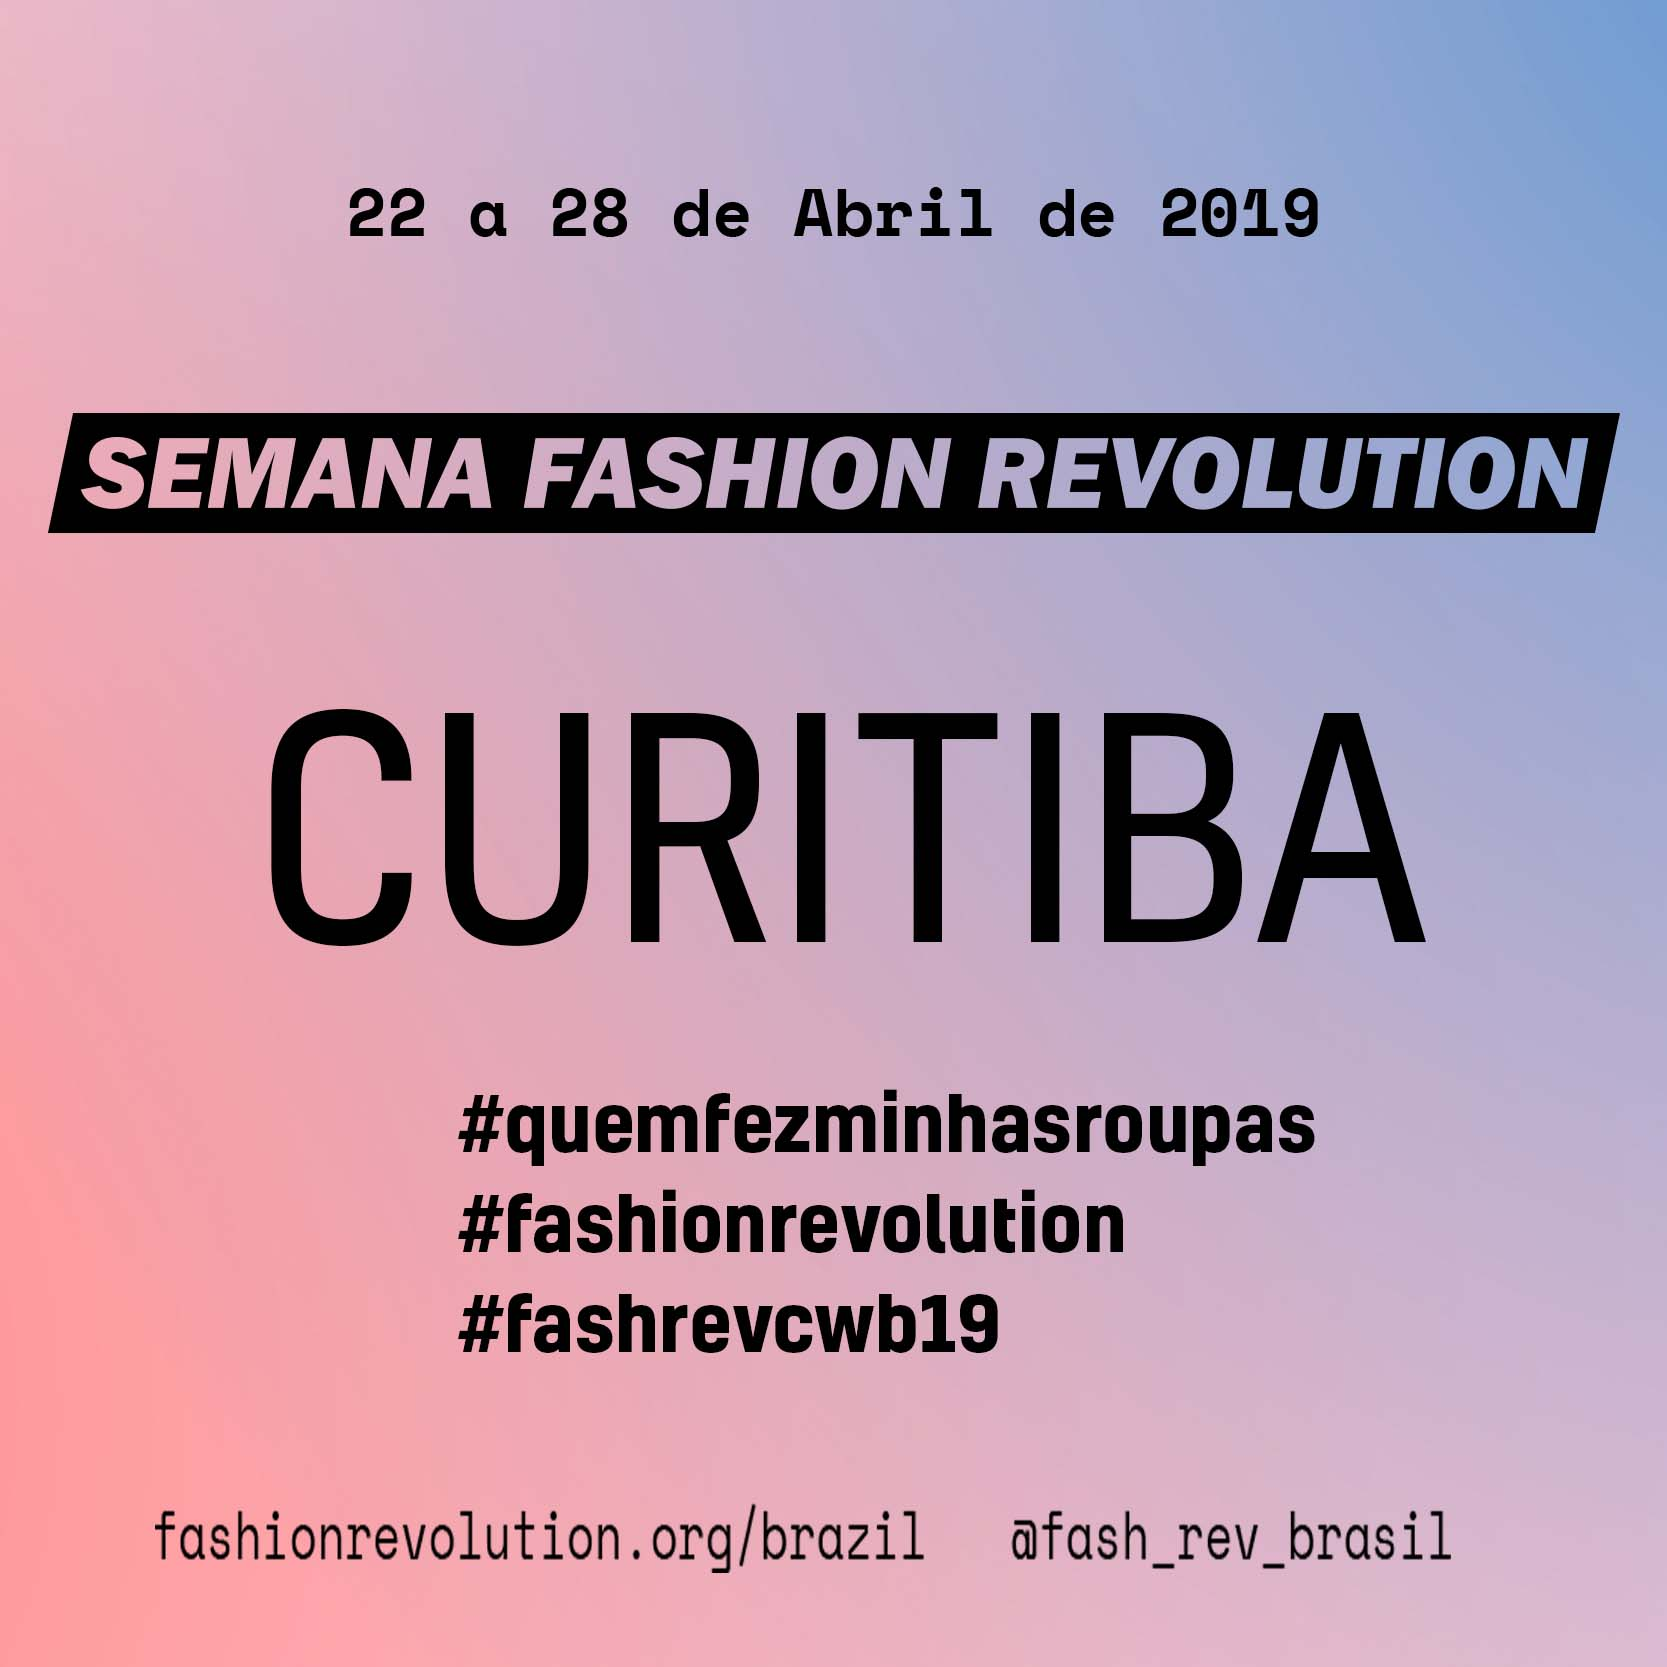 Semana Fashion Revolution . Curitiba 2019